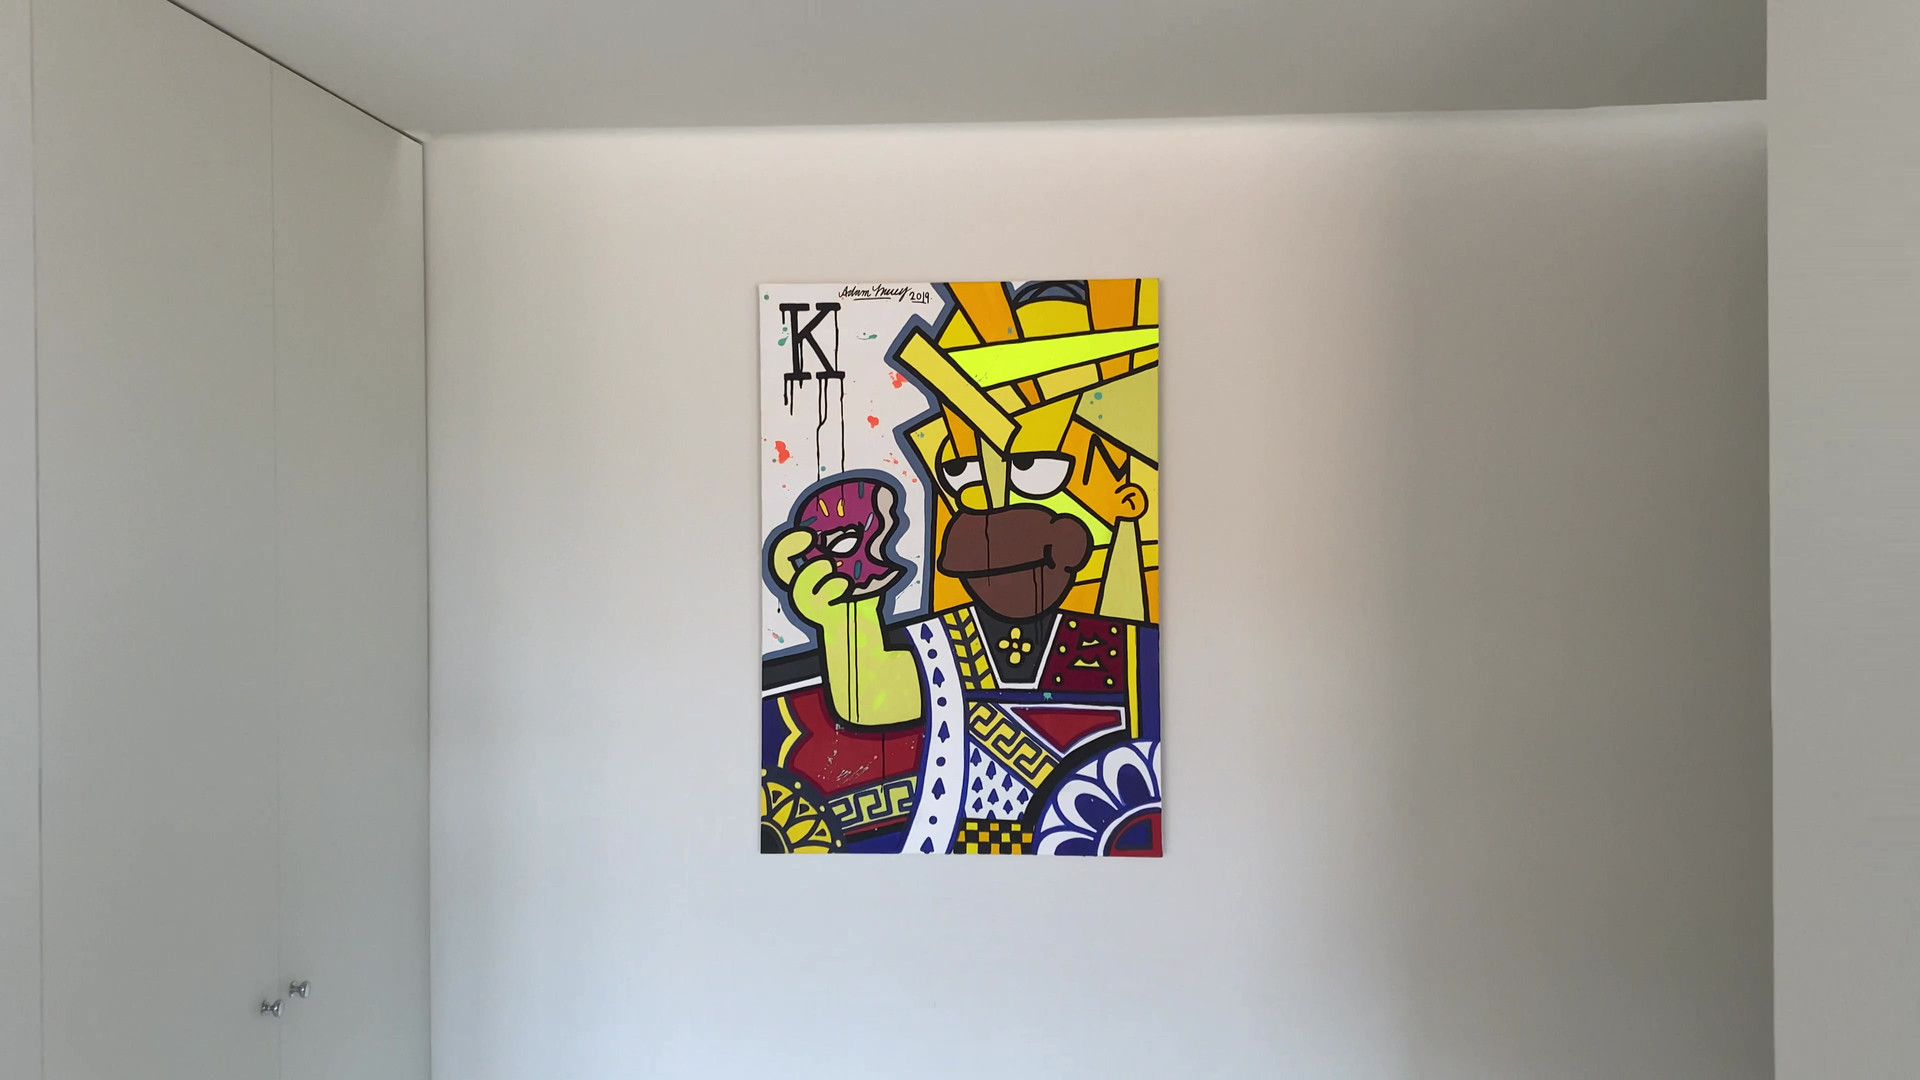 Works by Skott Marsi & Adam Lucey